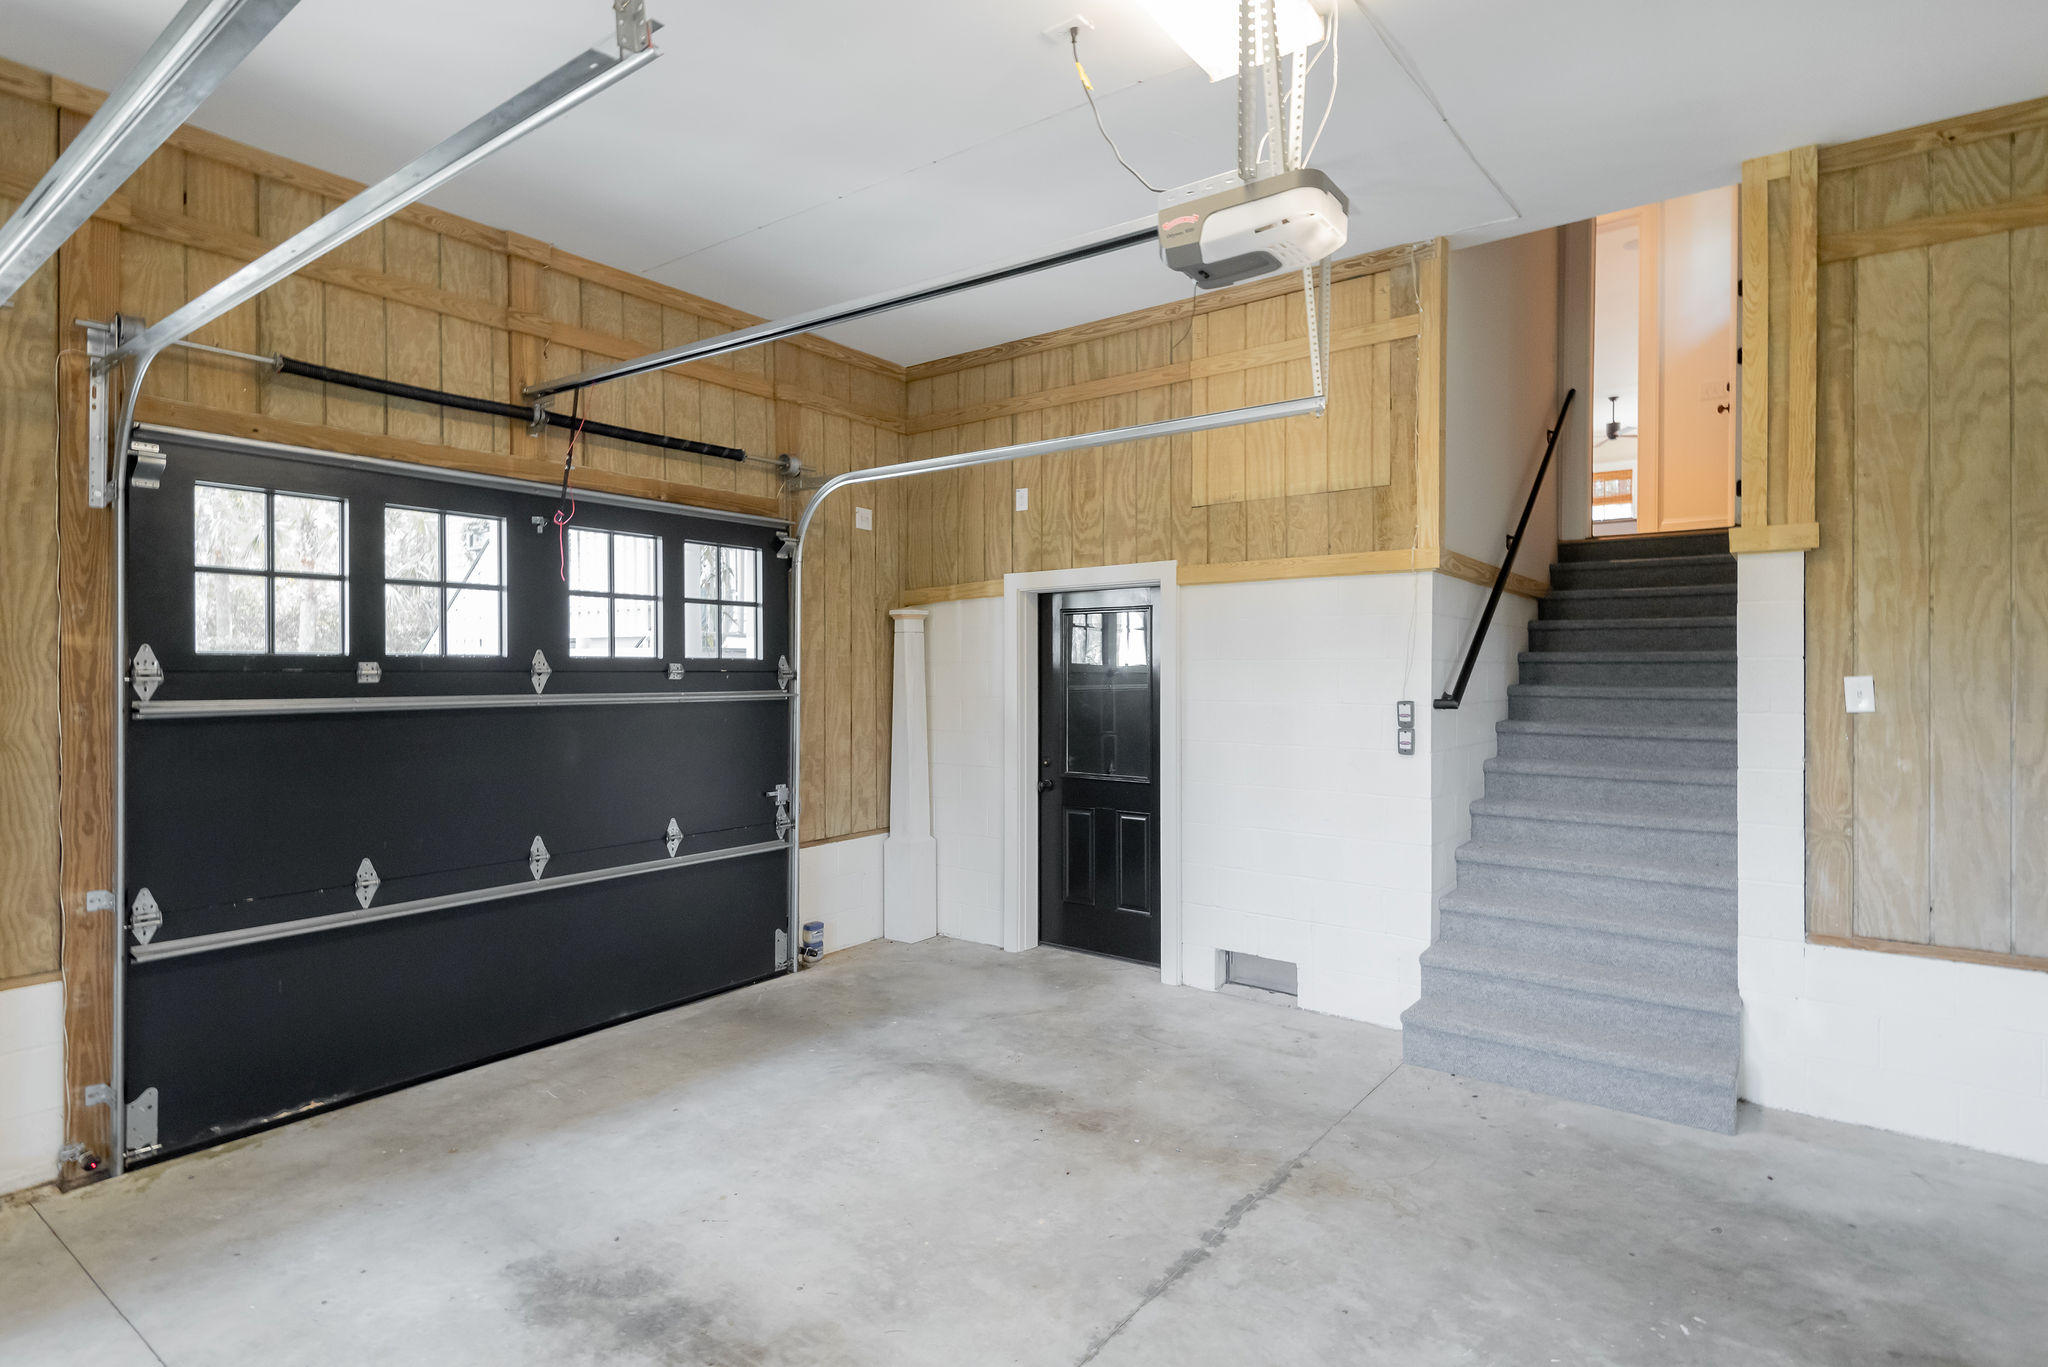 Kiawah Island Homes For Sale - 3 Grey Widgeon, Kiawah Island, SC - 39